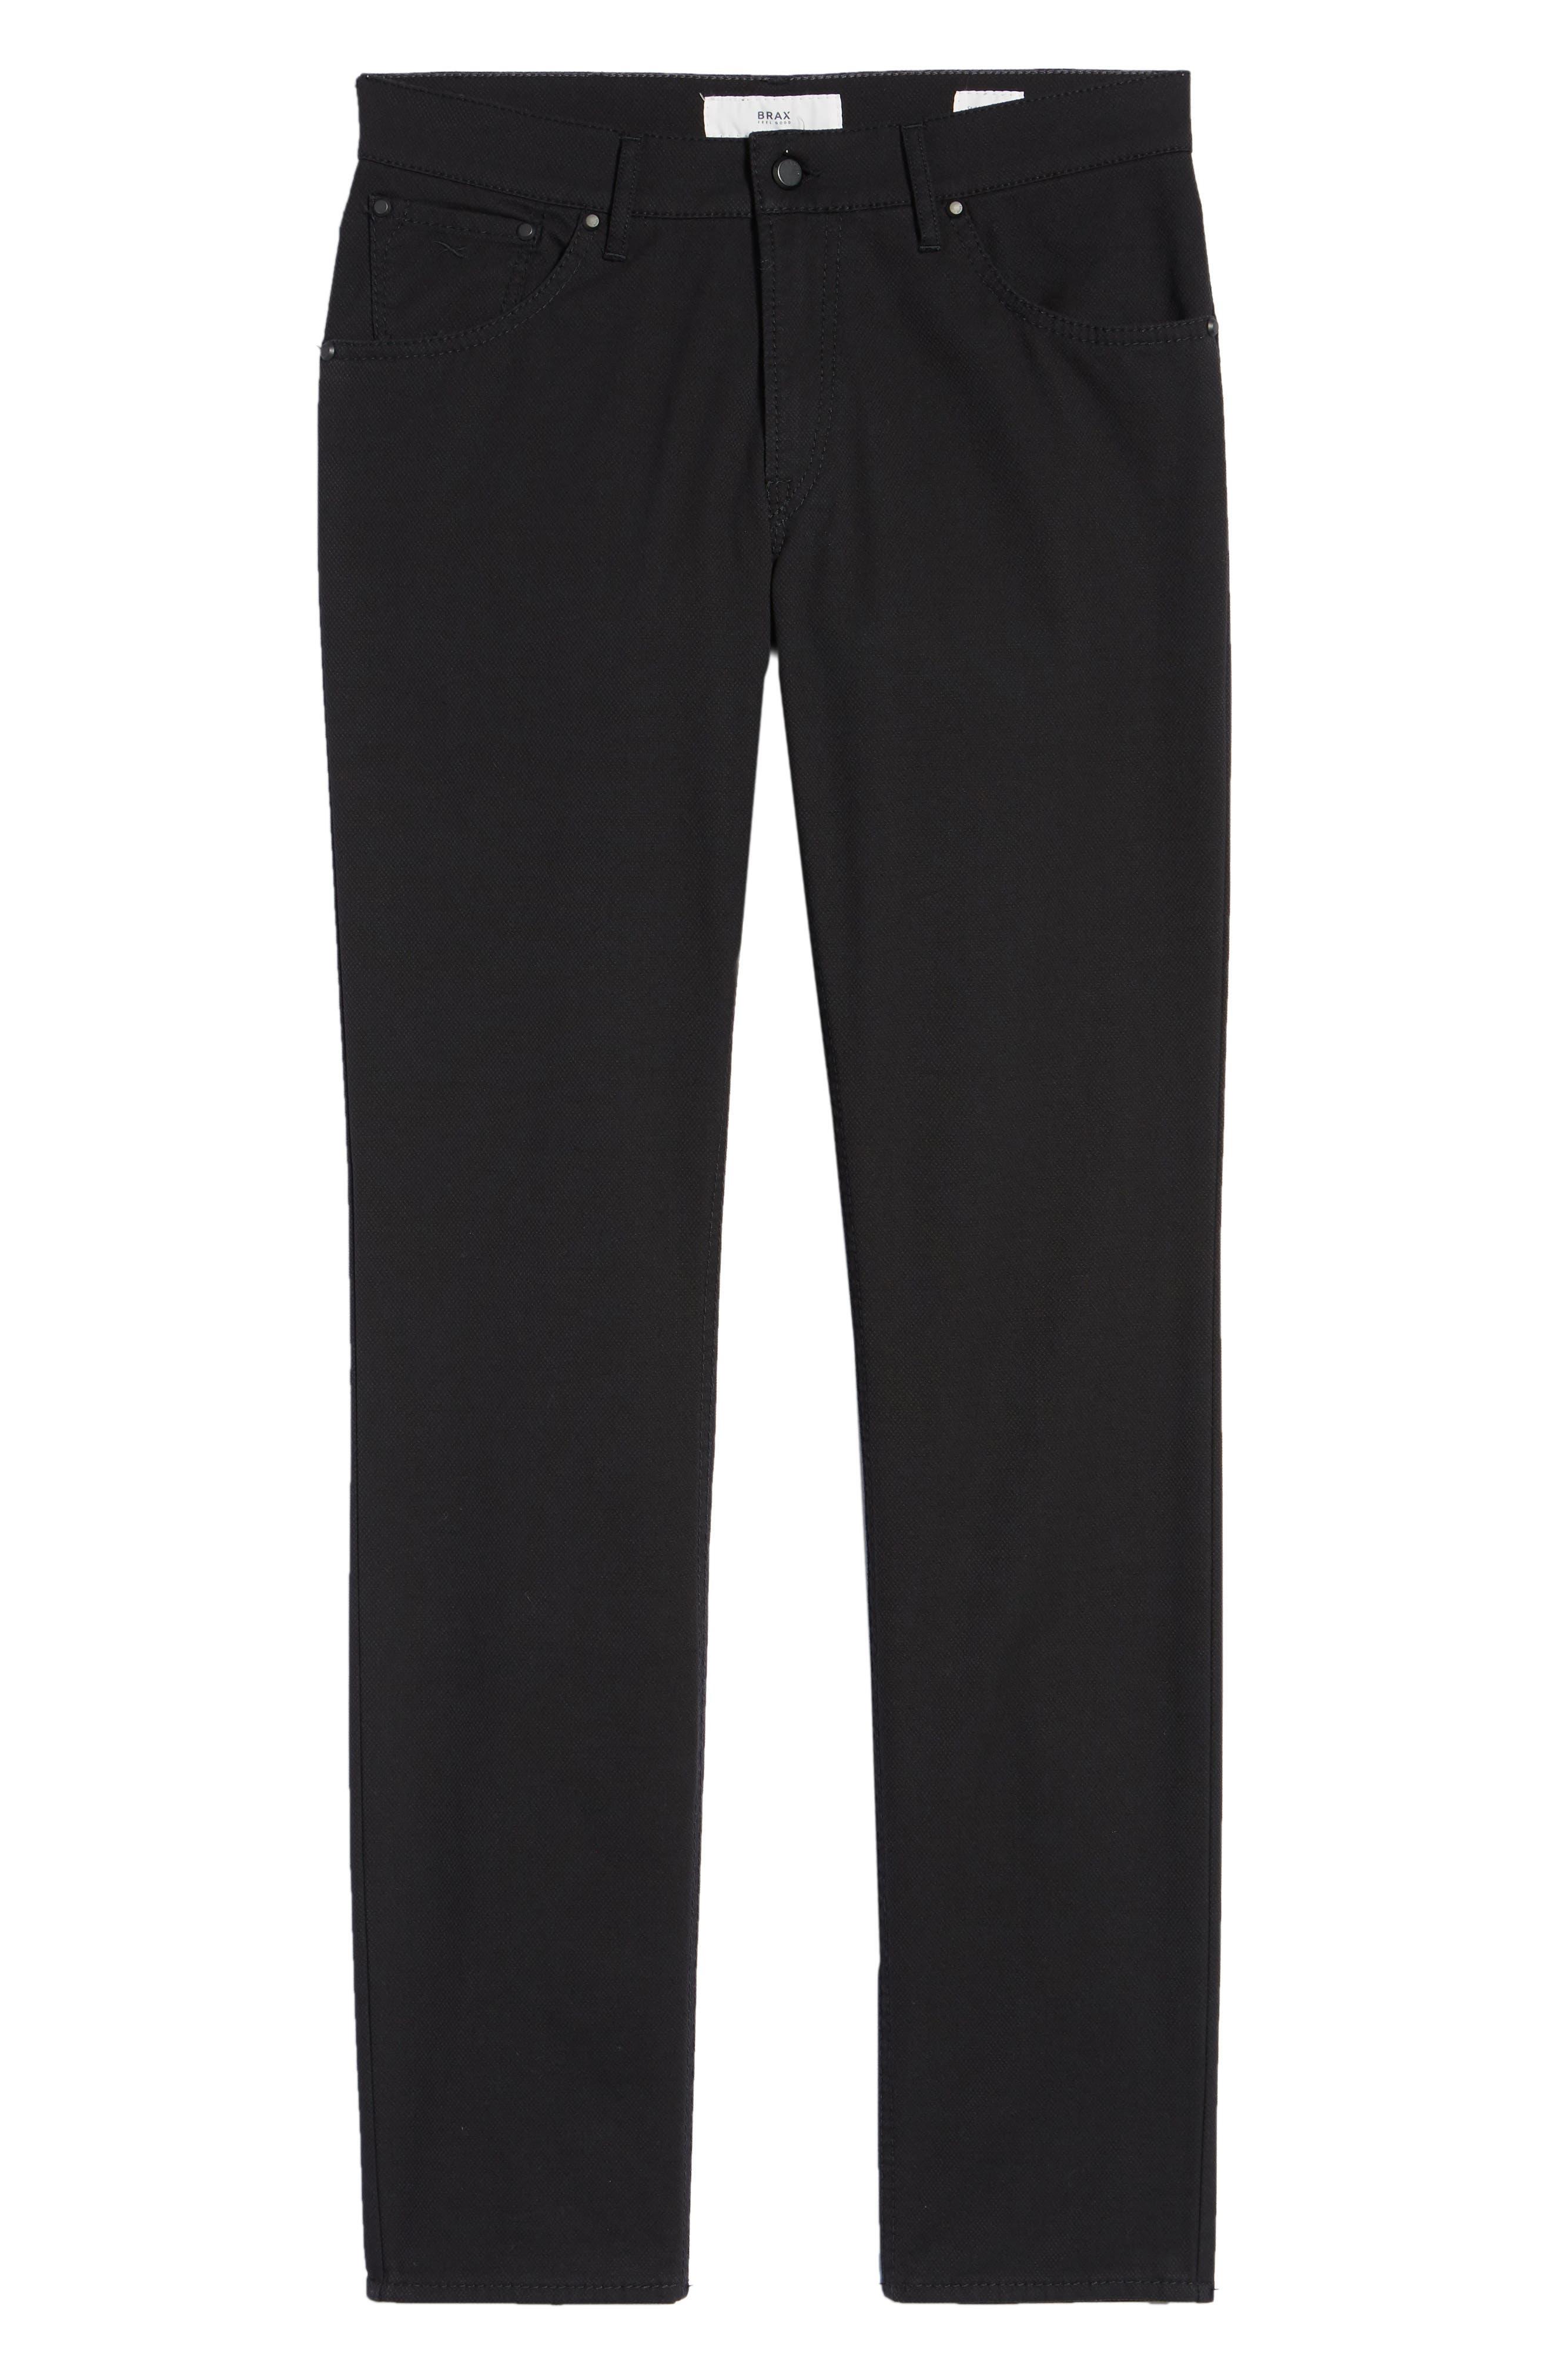 Woolook Diamond Slim Fit Pants,                             Alternate thumbnail 6, color,                             BLACK